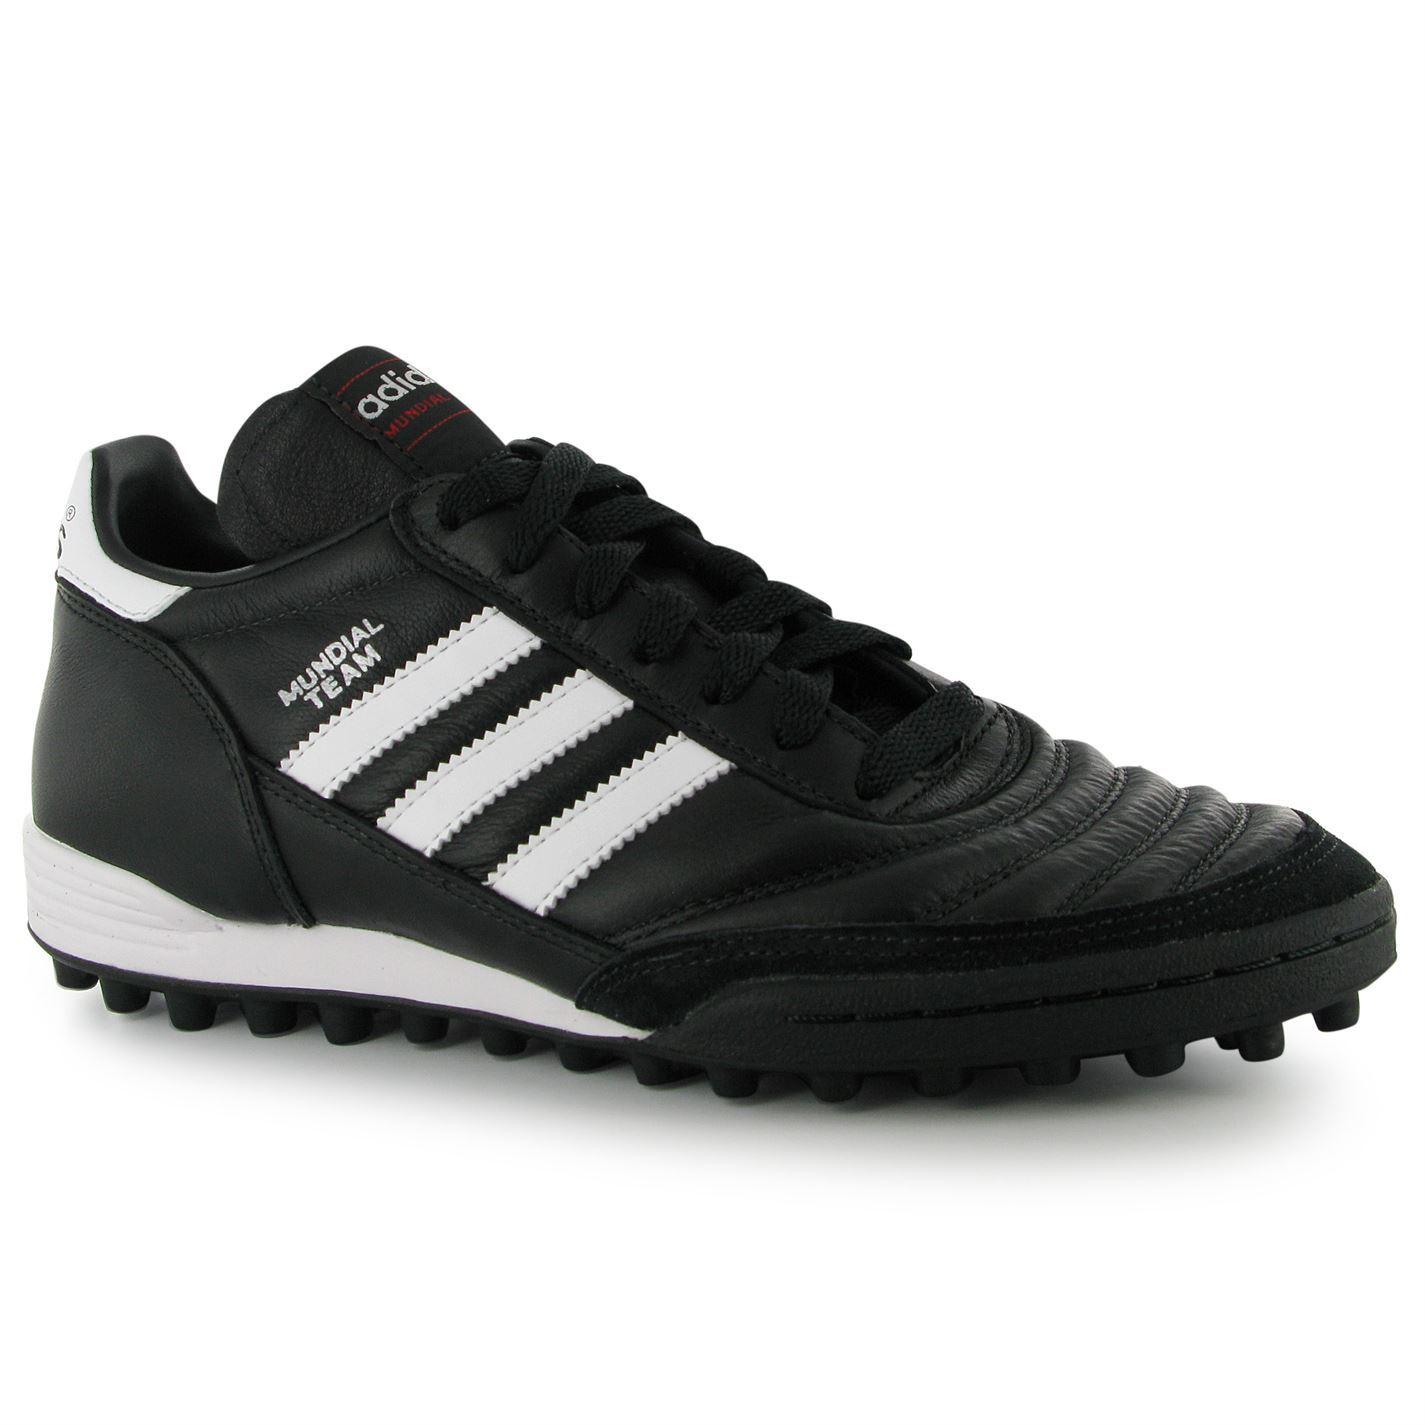 buy online fe6fa 322b2 ... Adidas Mundial Team Mens Astro Turf Trainer Blk Wht Football Soccer  Boots ...